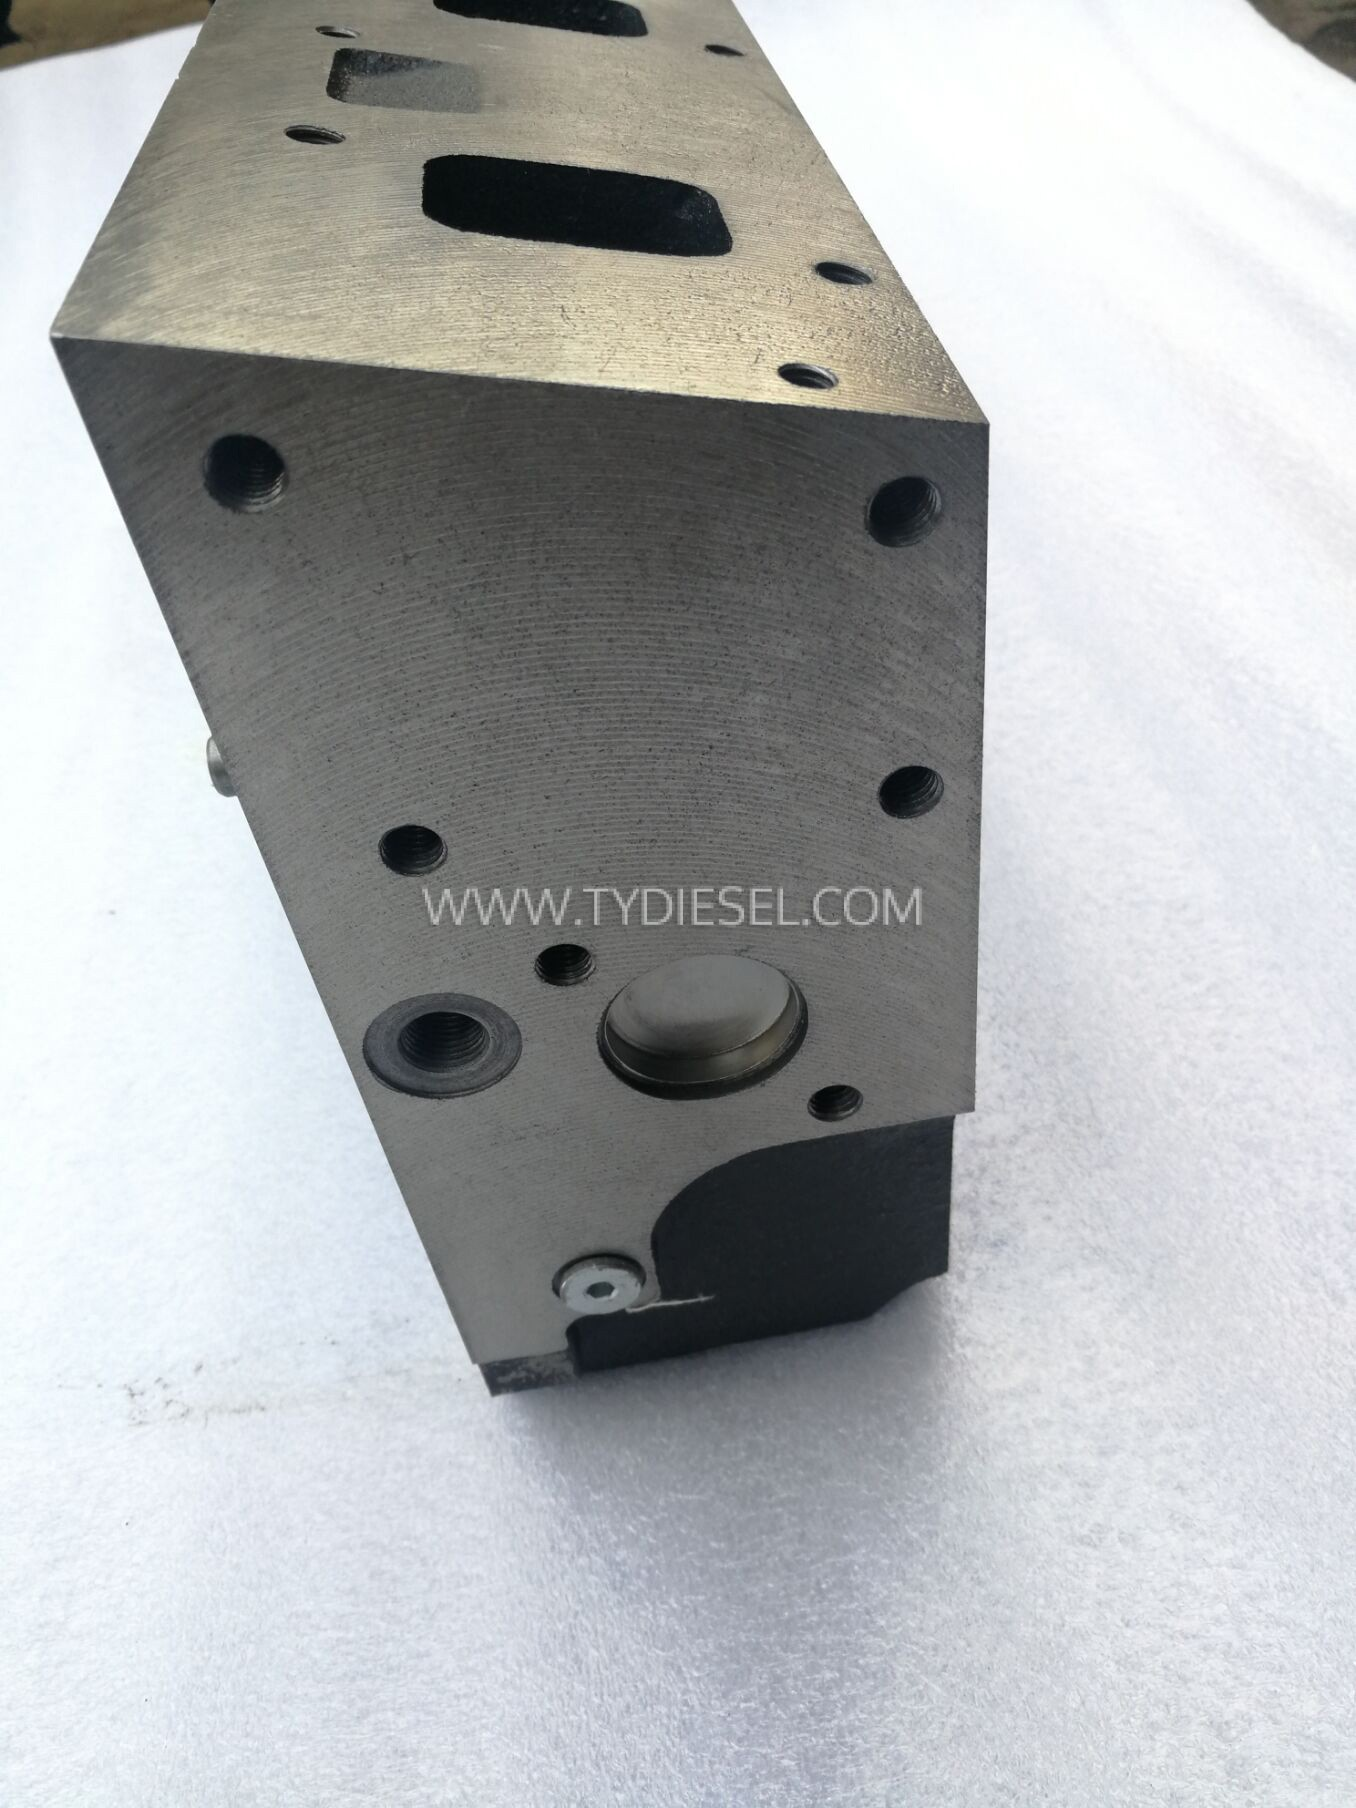 Catepillar 3116 Cylinder Head